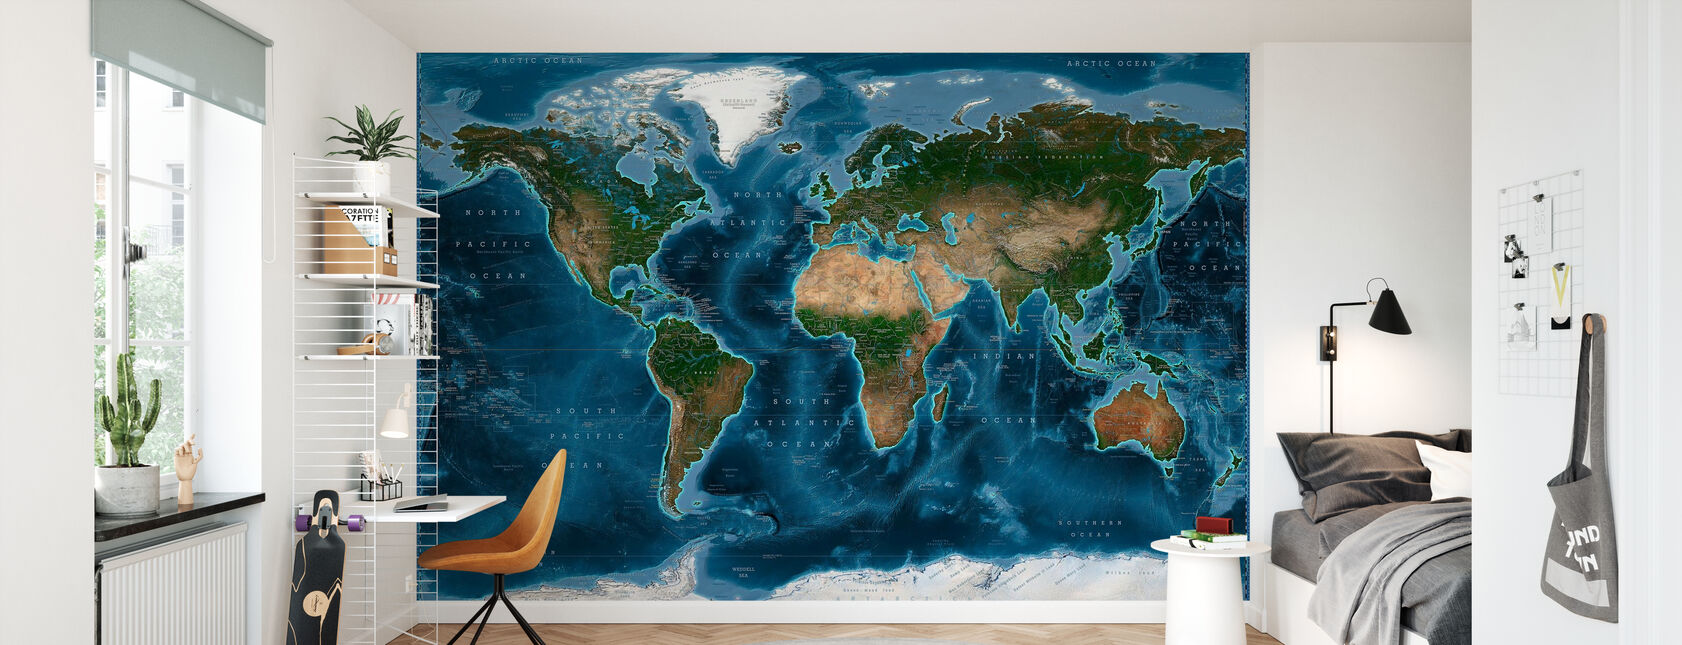 Satelite Karta - Tapet - Barnrum